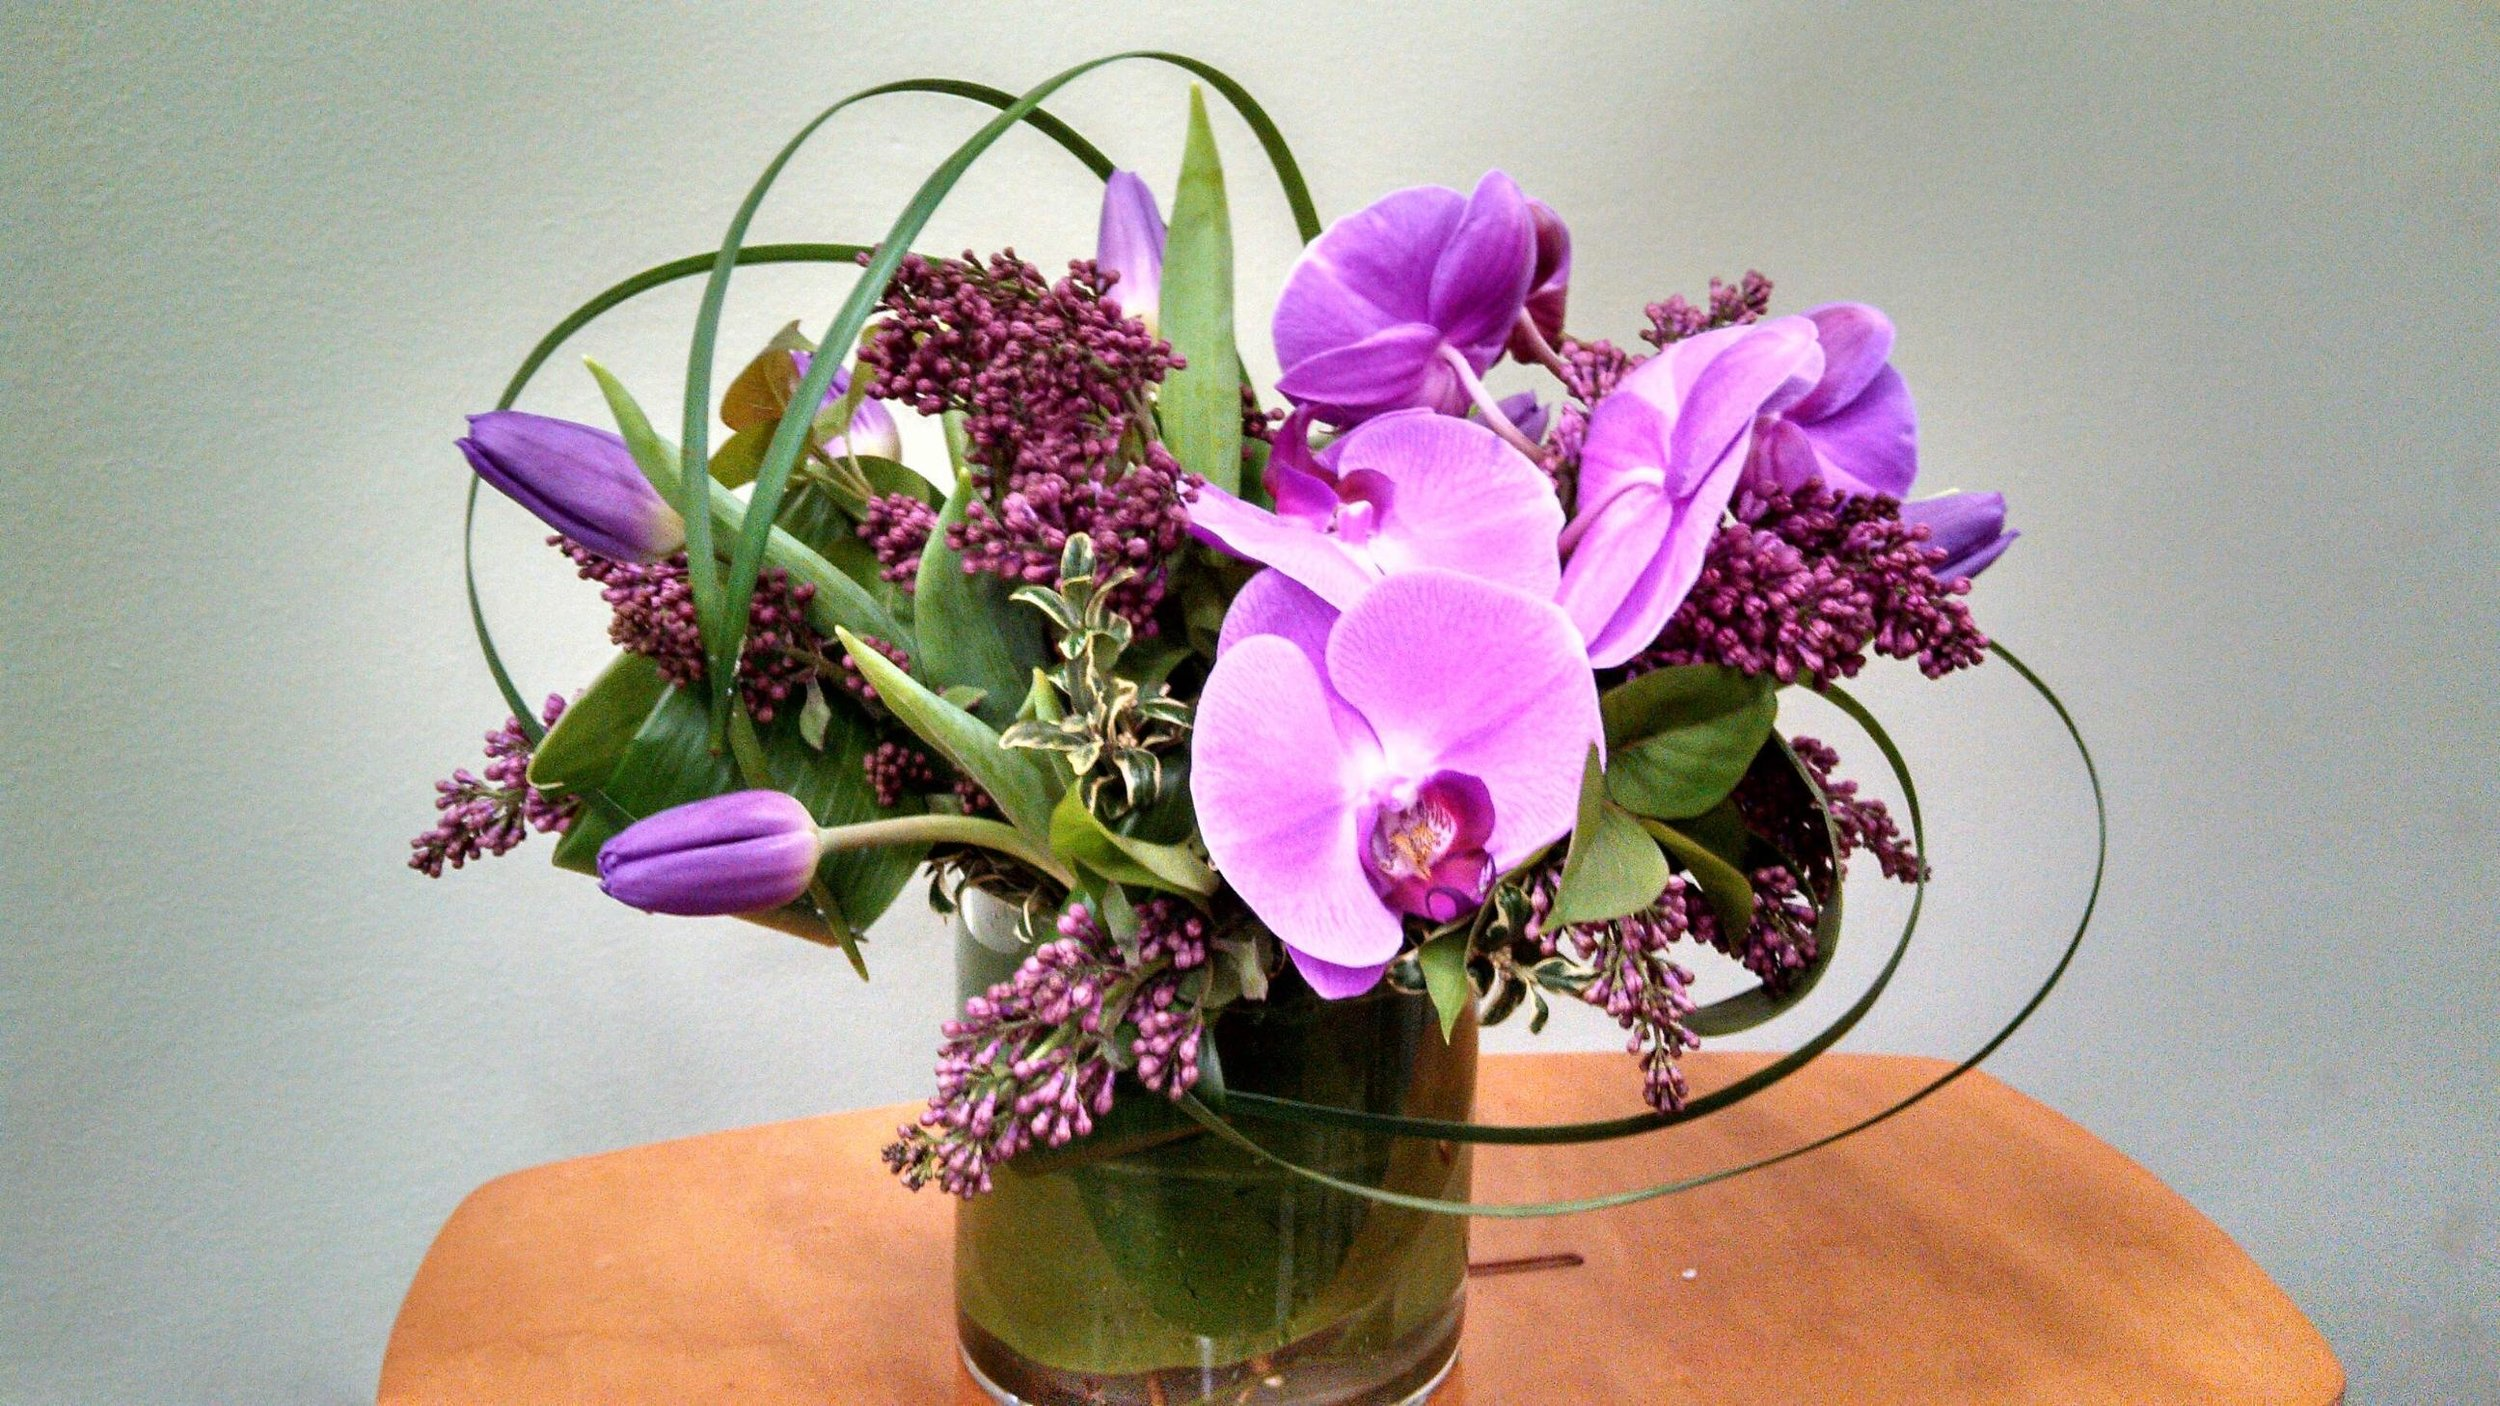 39. Architectural romantic bouquet with phaleonopsis orchid